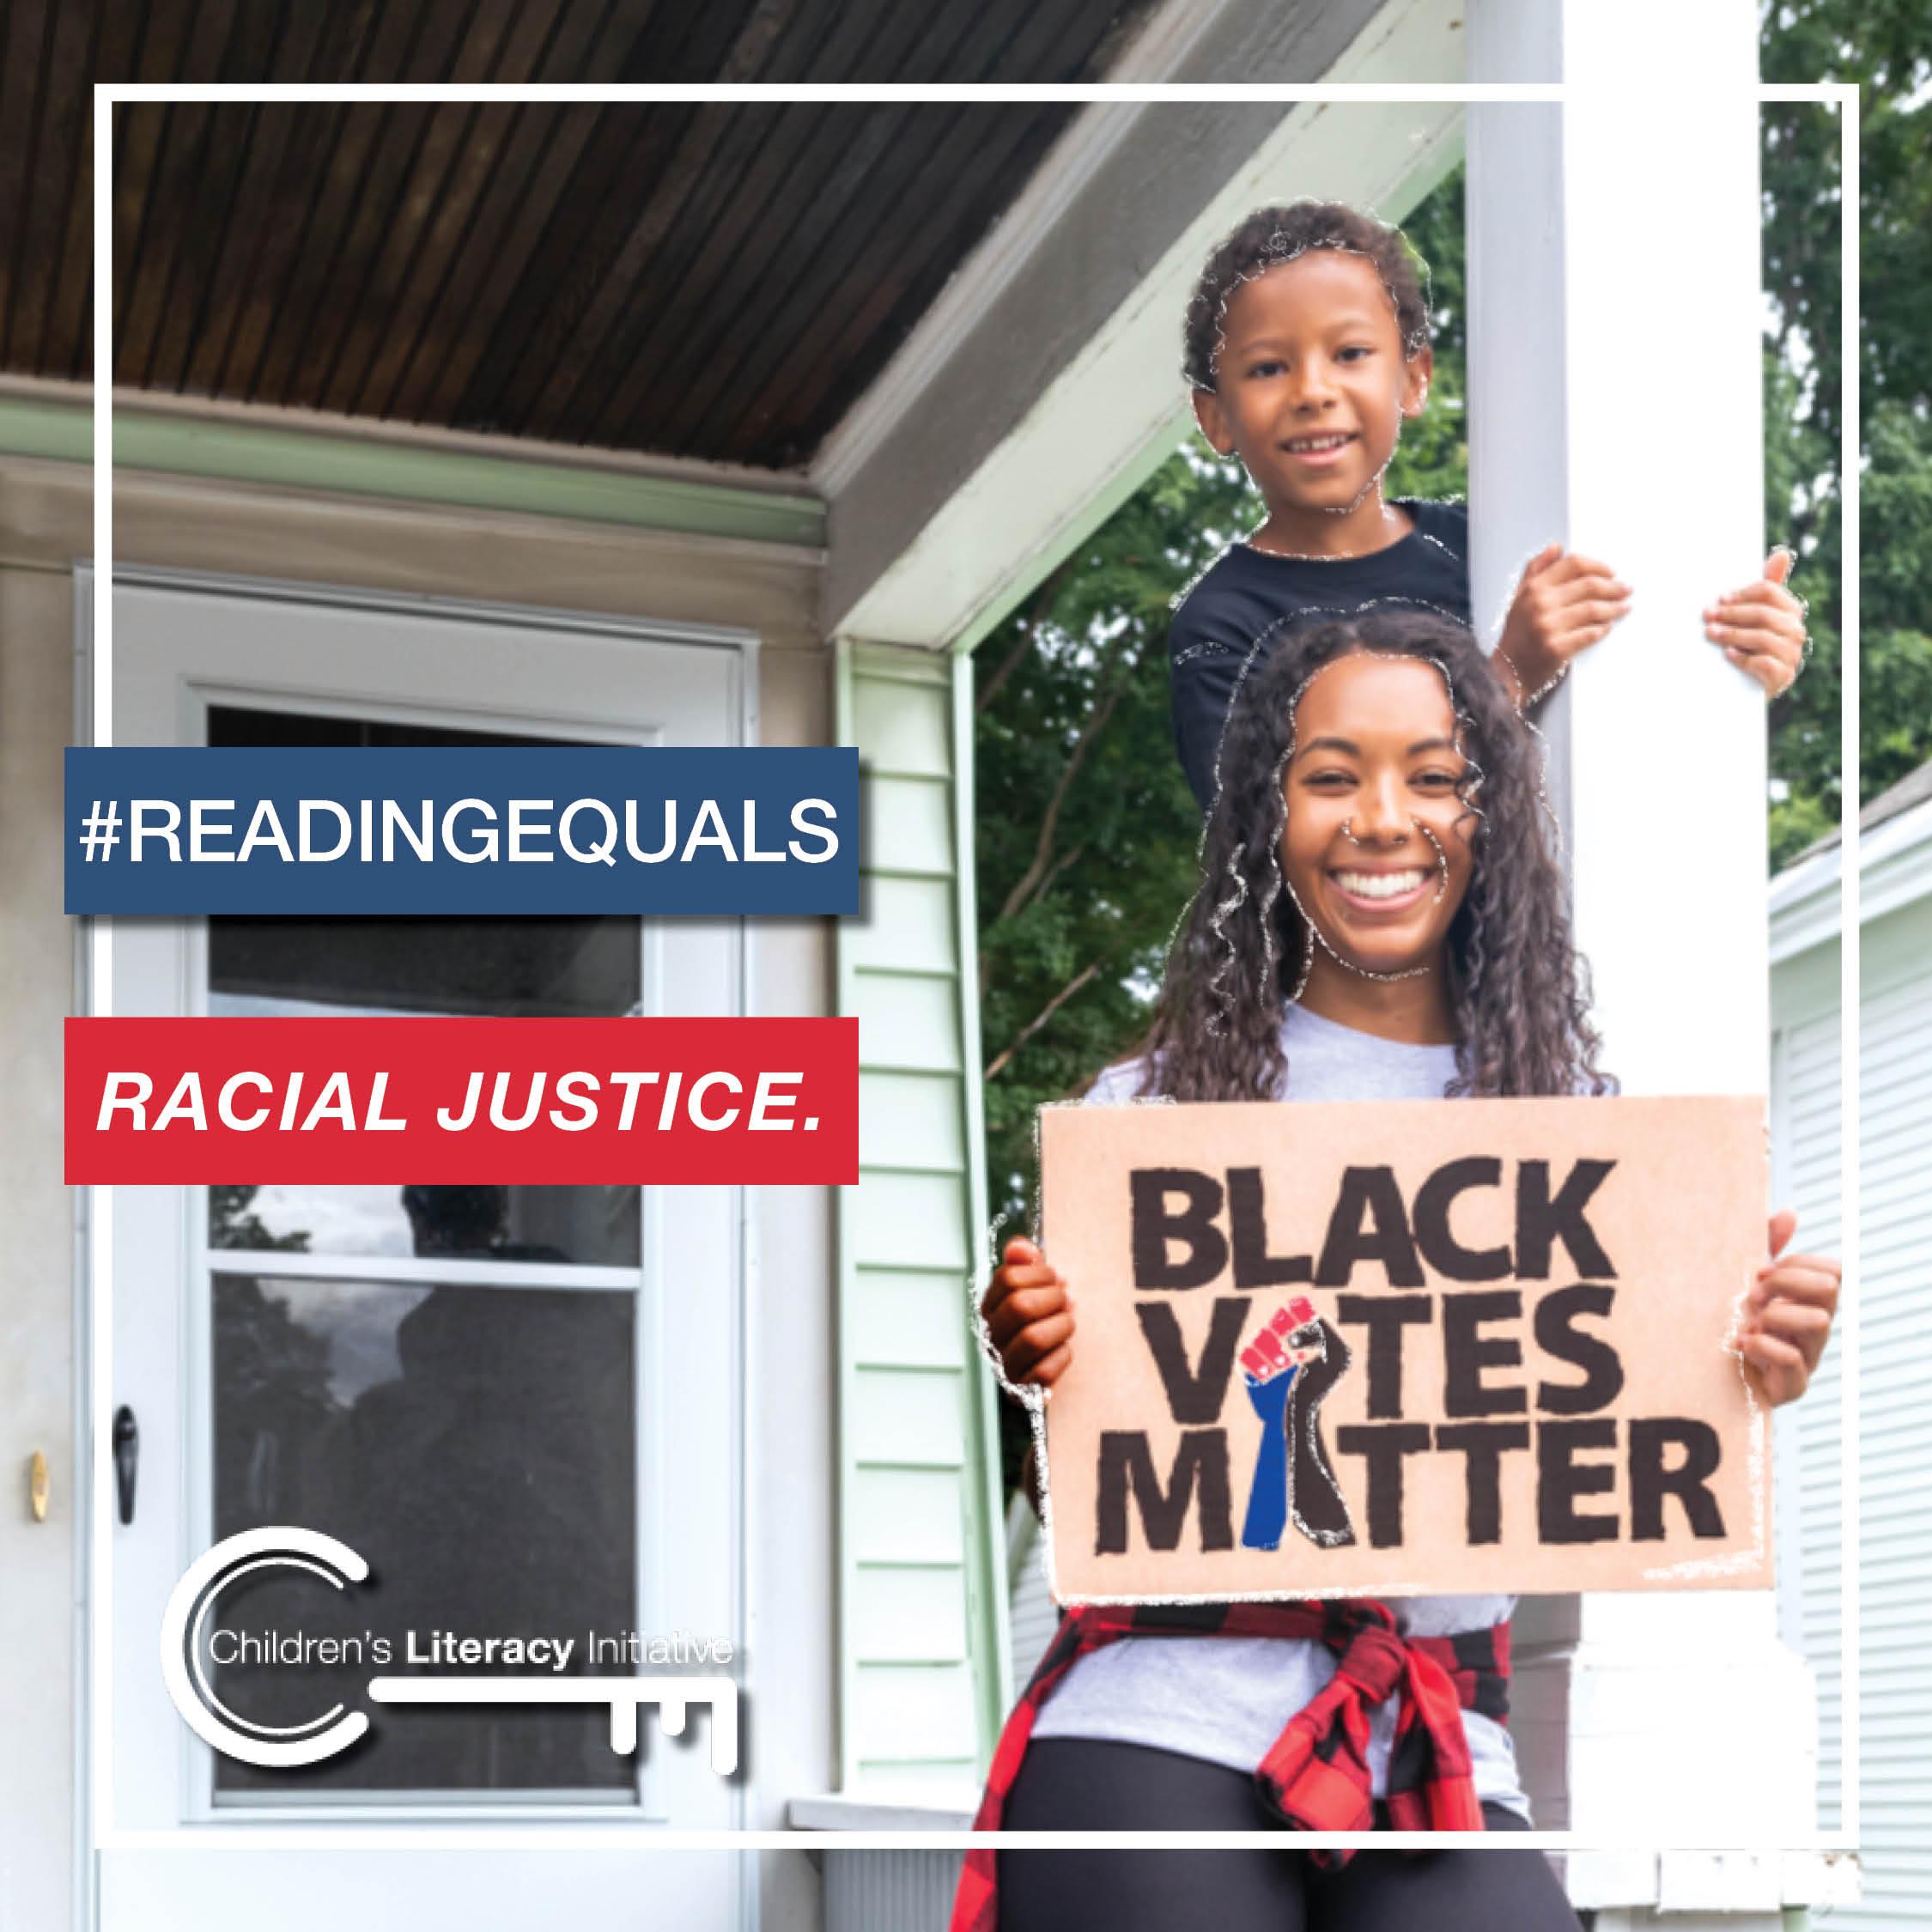 #ReadingEquals #RacialJustice